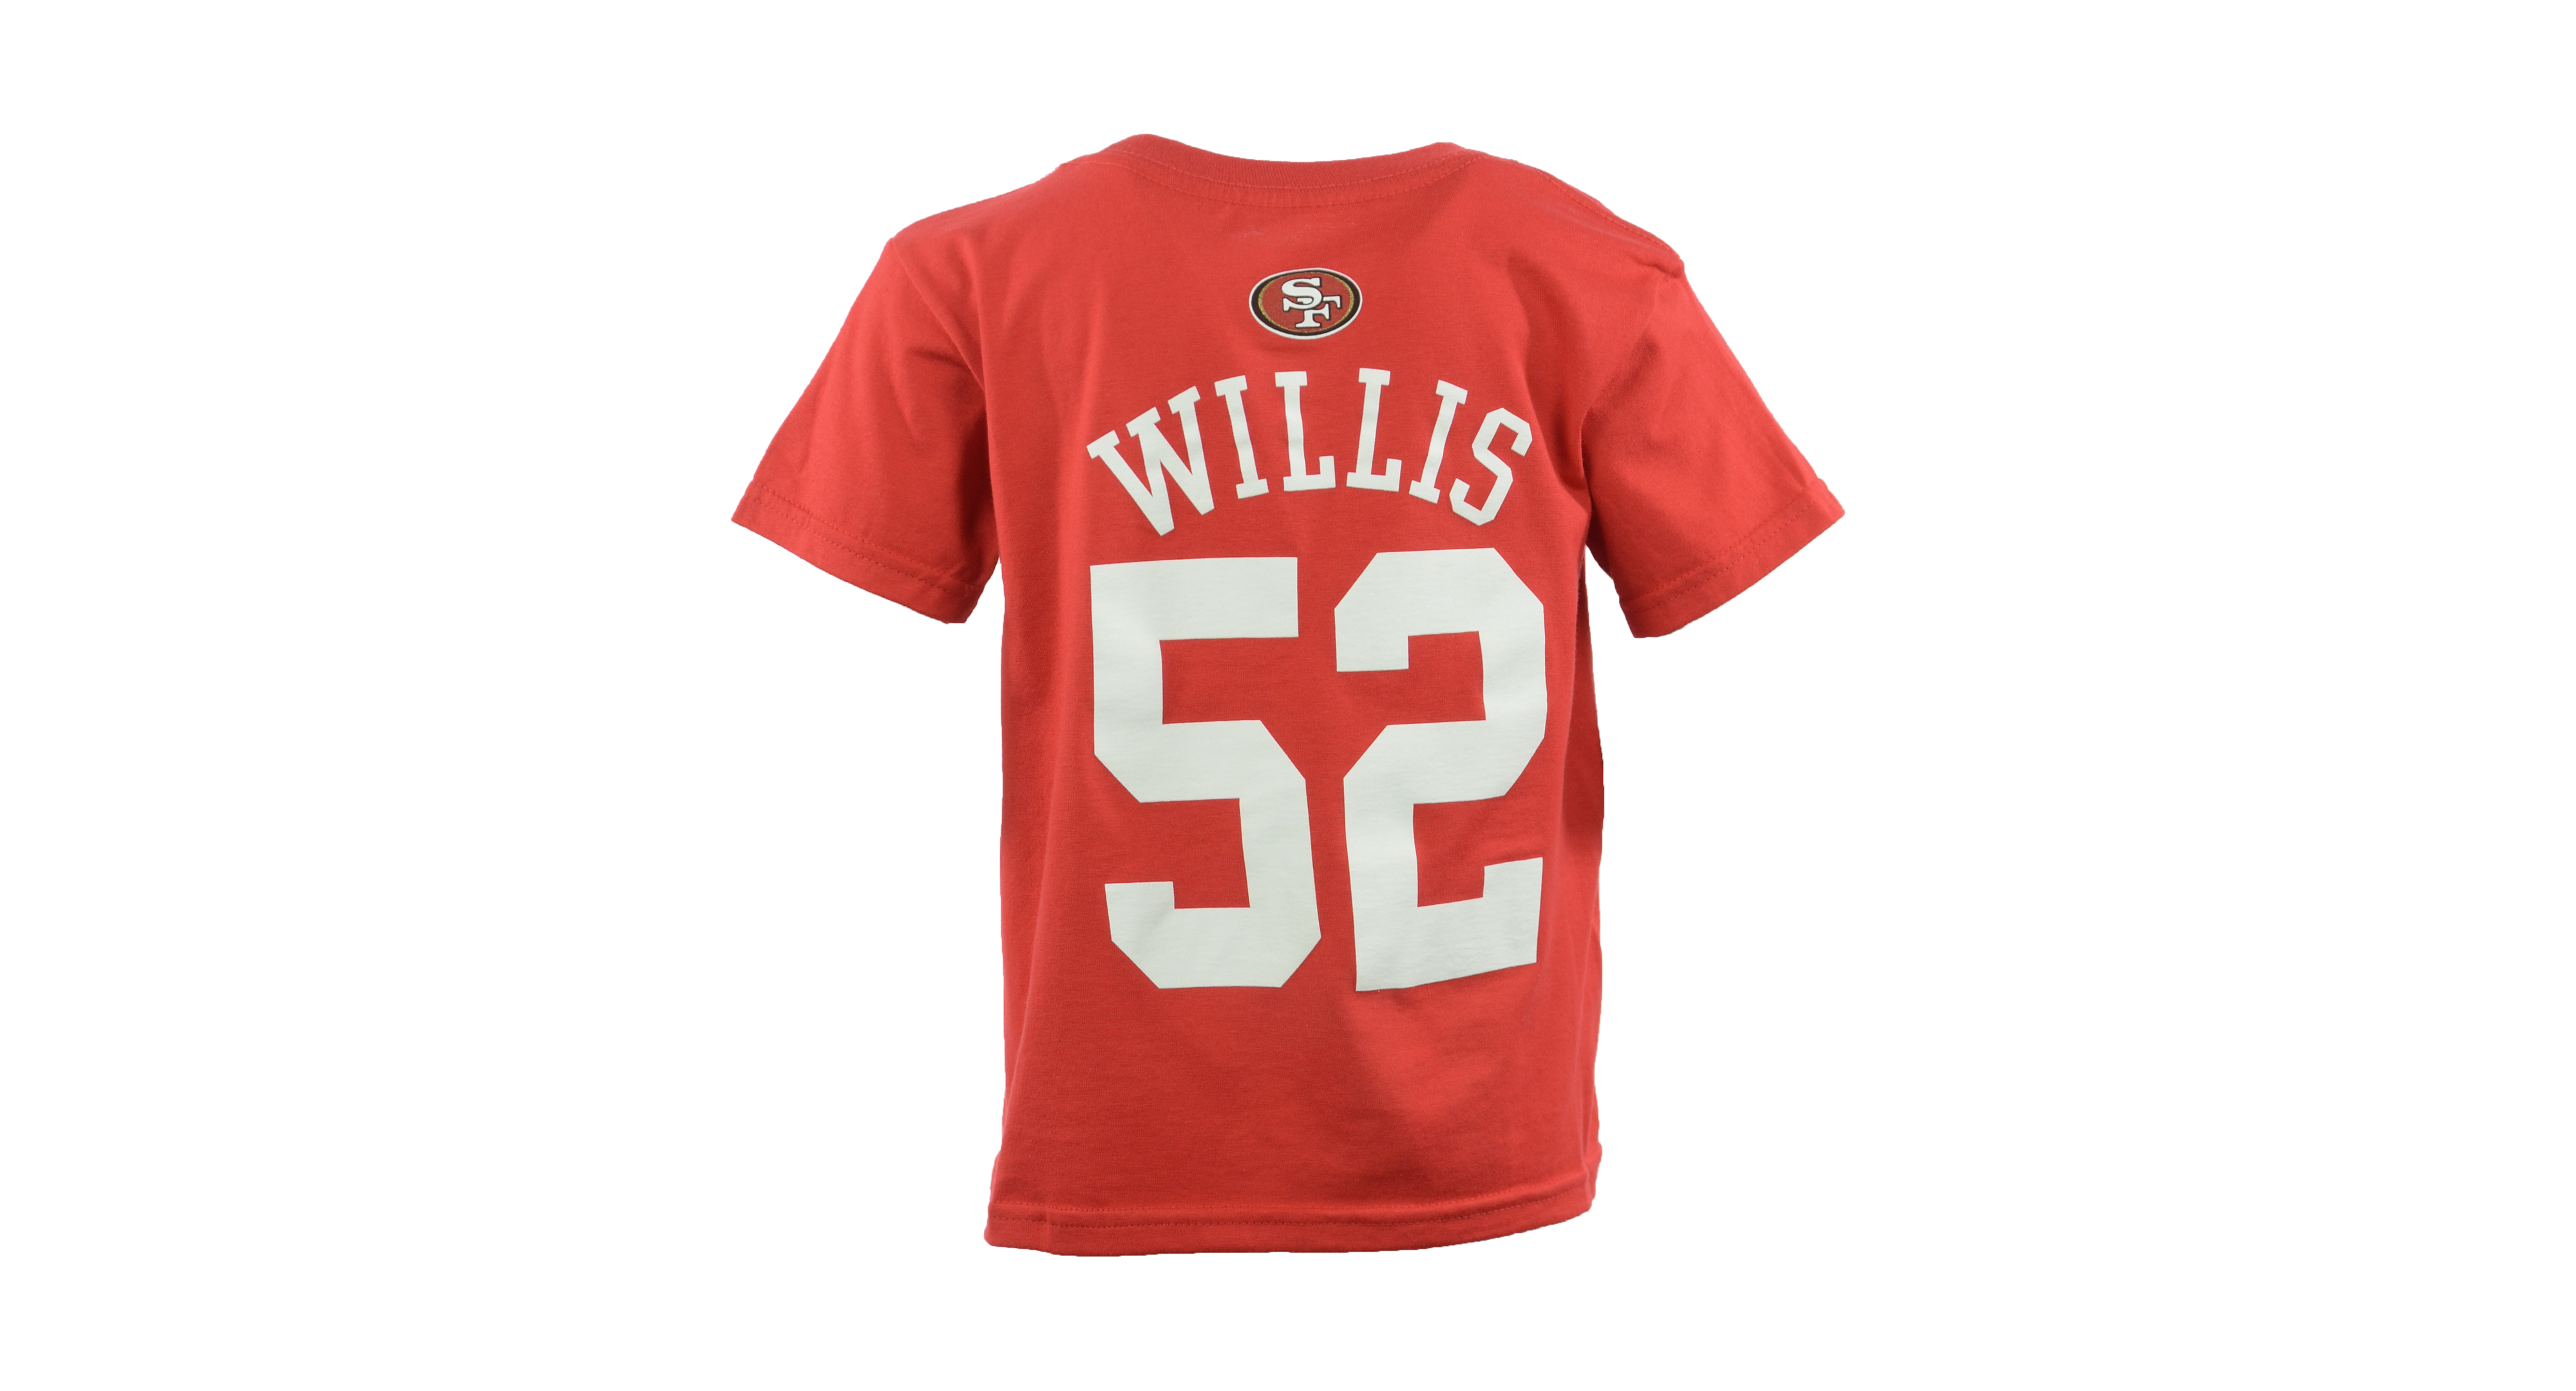 quality design a16f3 e5a67 Outerstuff Little Boys' Patrick Willis San Francisco 49ers ...